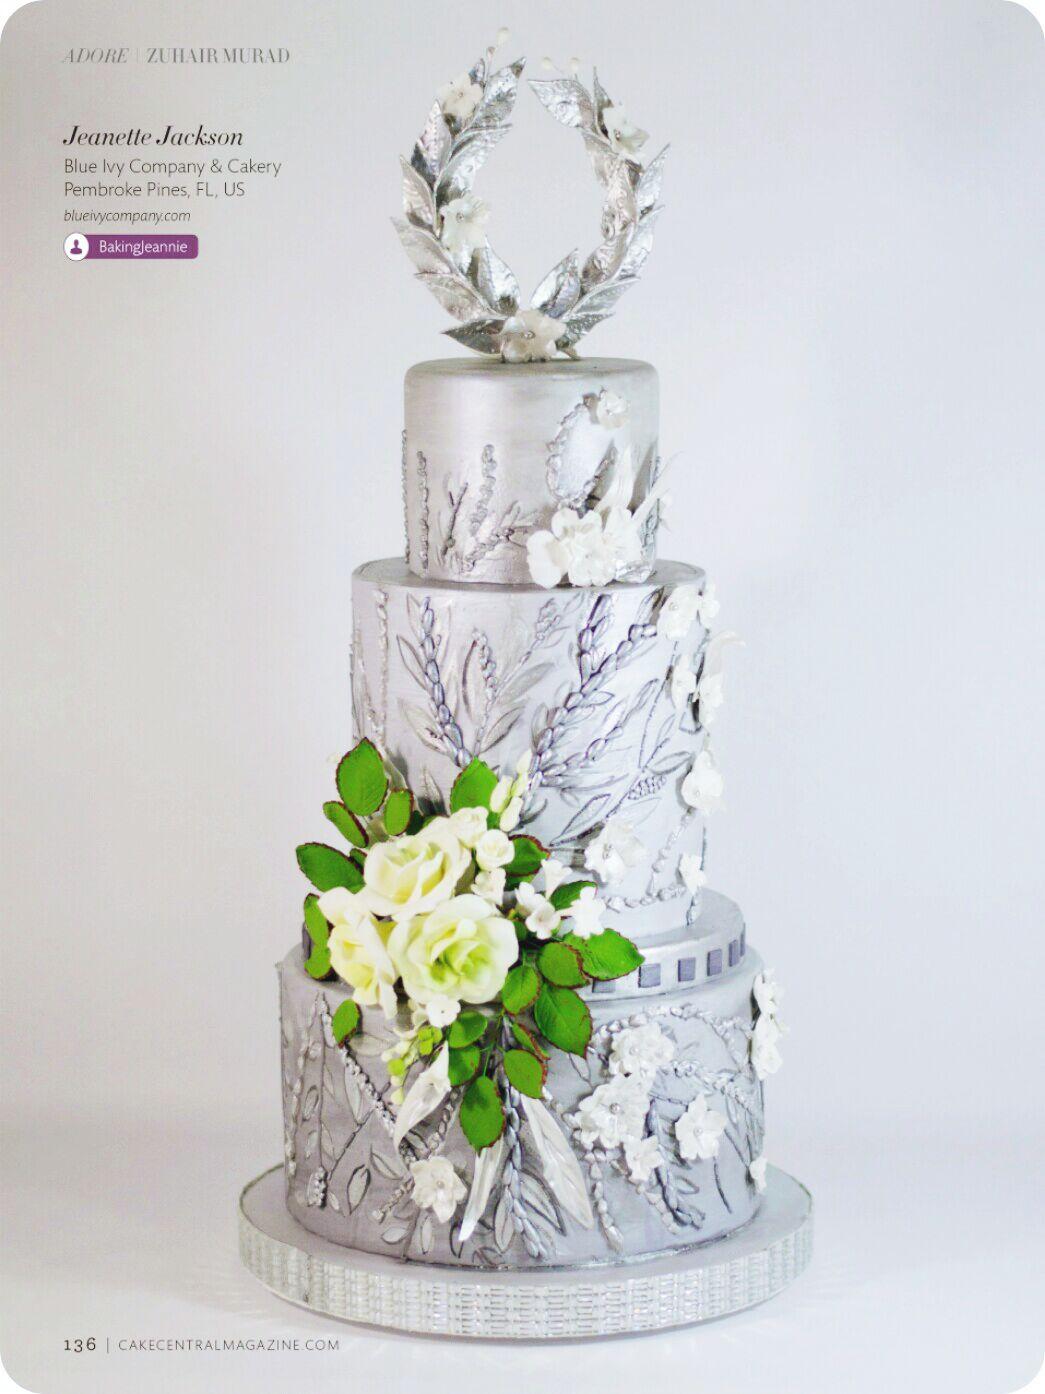 Cake Central Magazine